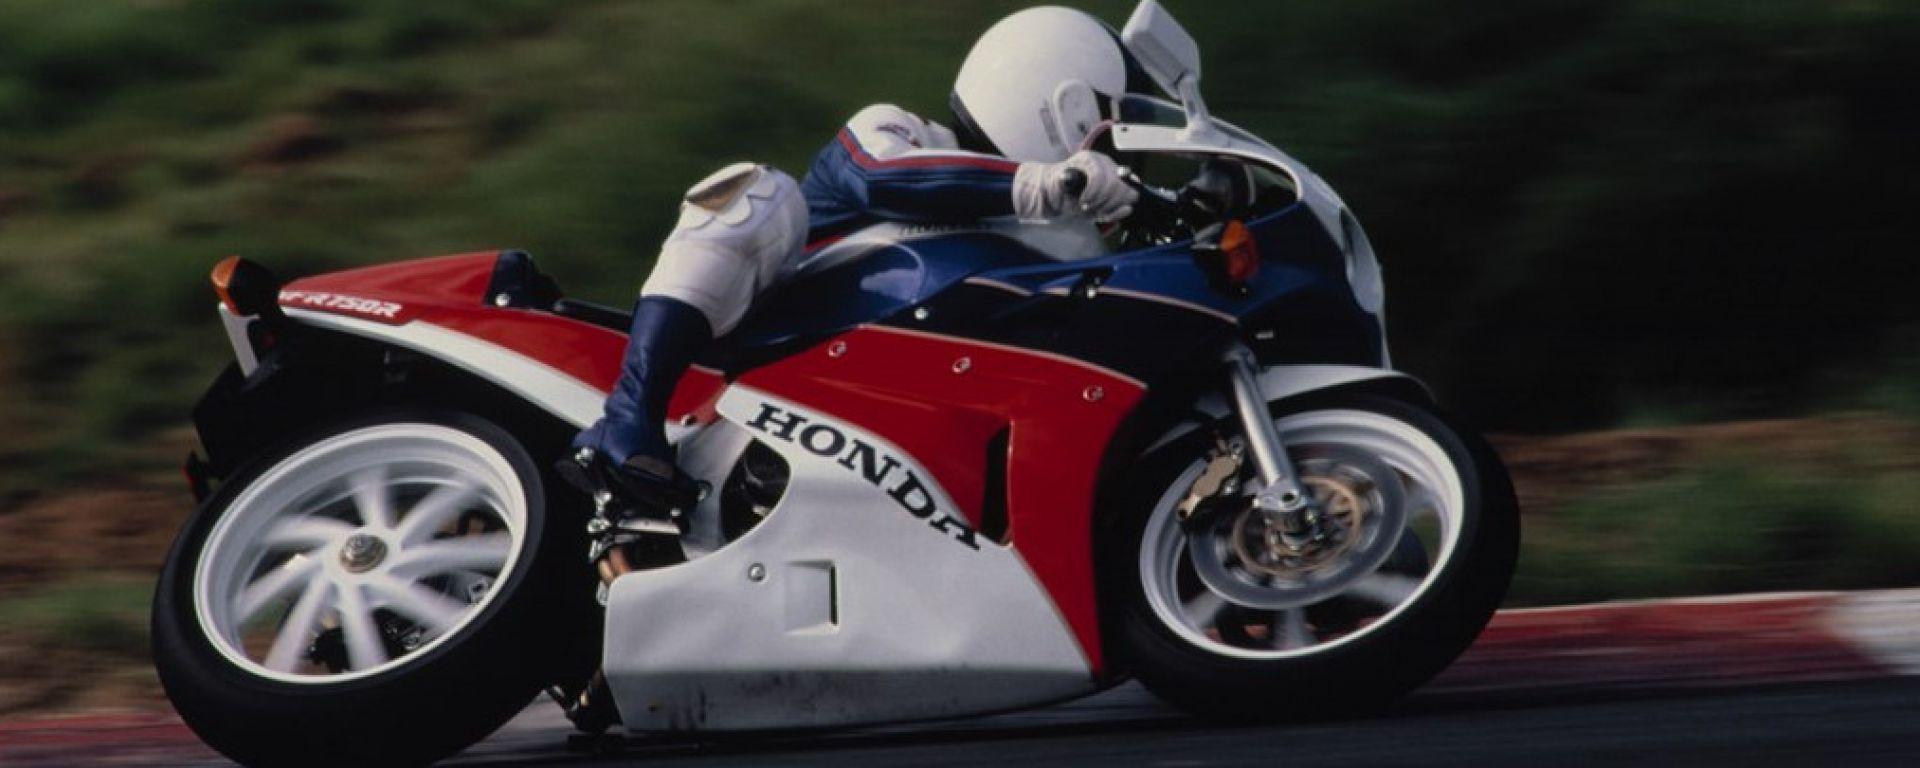 Honda RC30 (VFR750R)